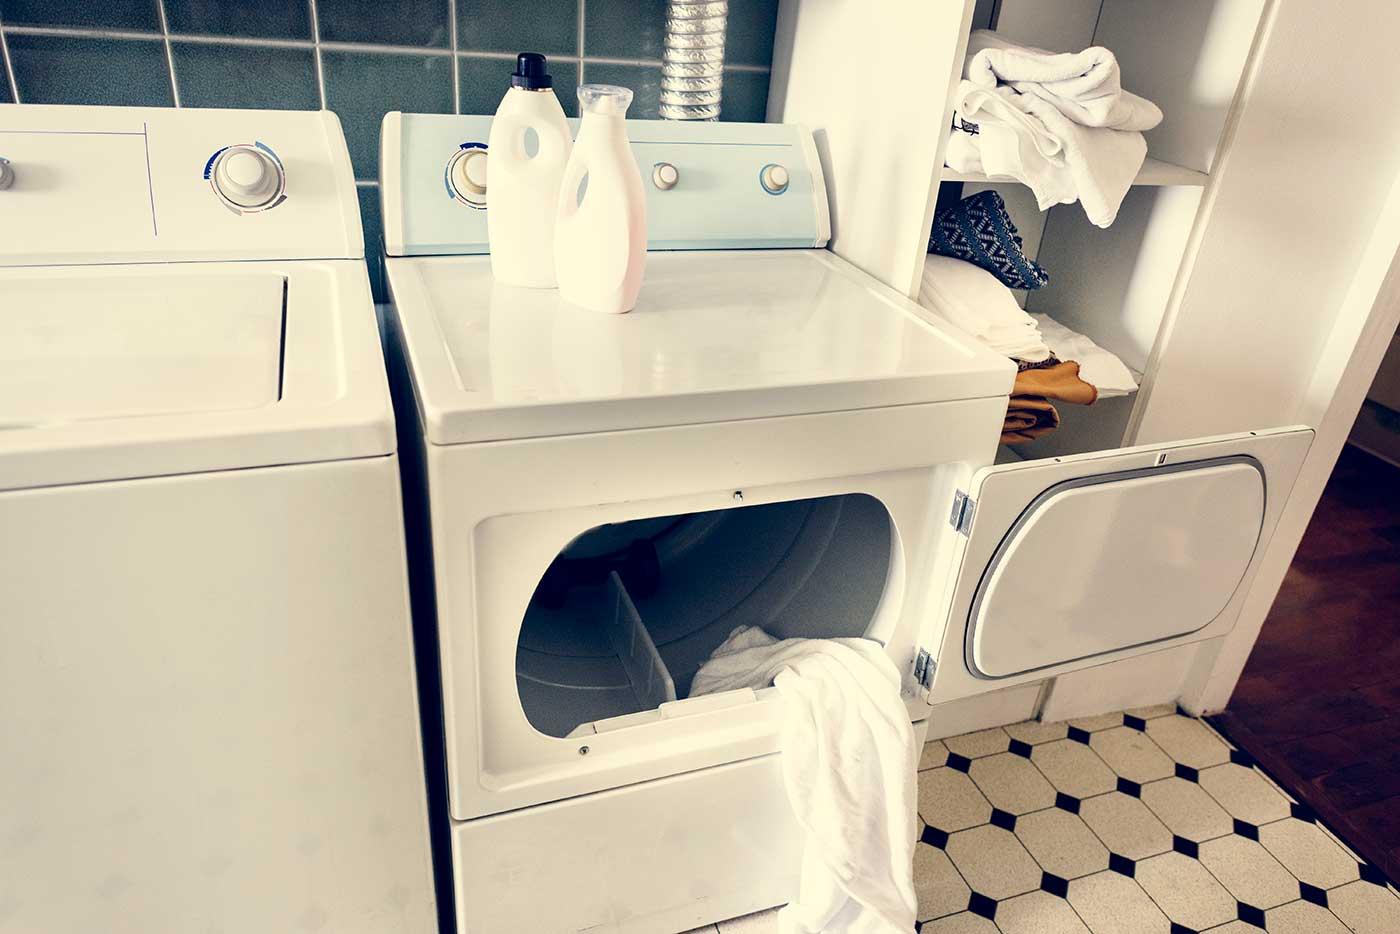 Dryer Vent Cleaning Chimney Sweep San Antonio Aaa